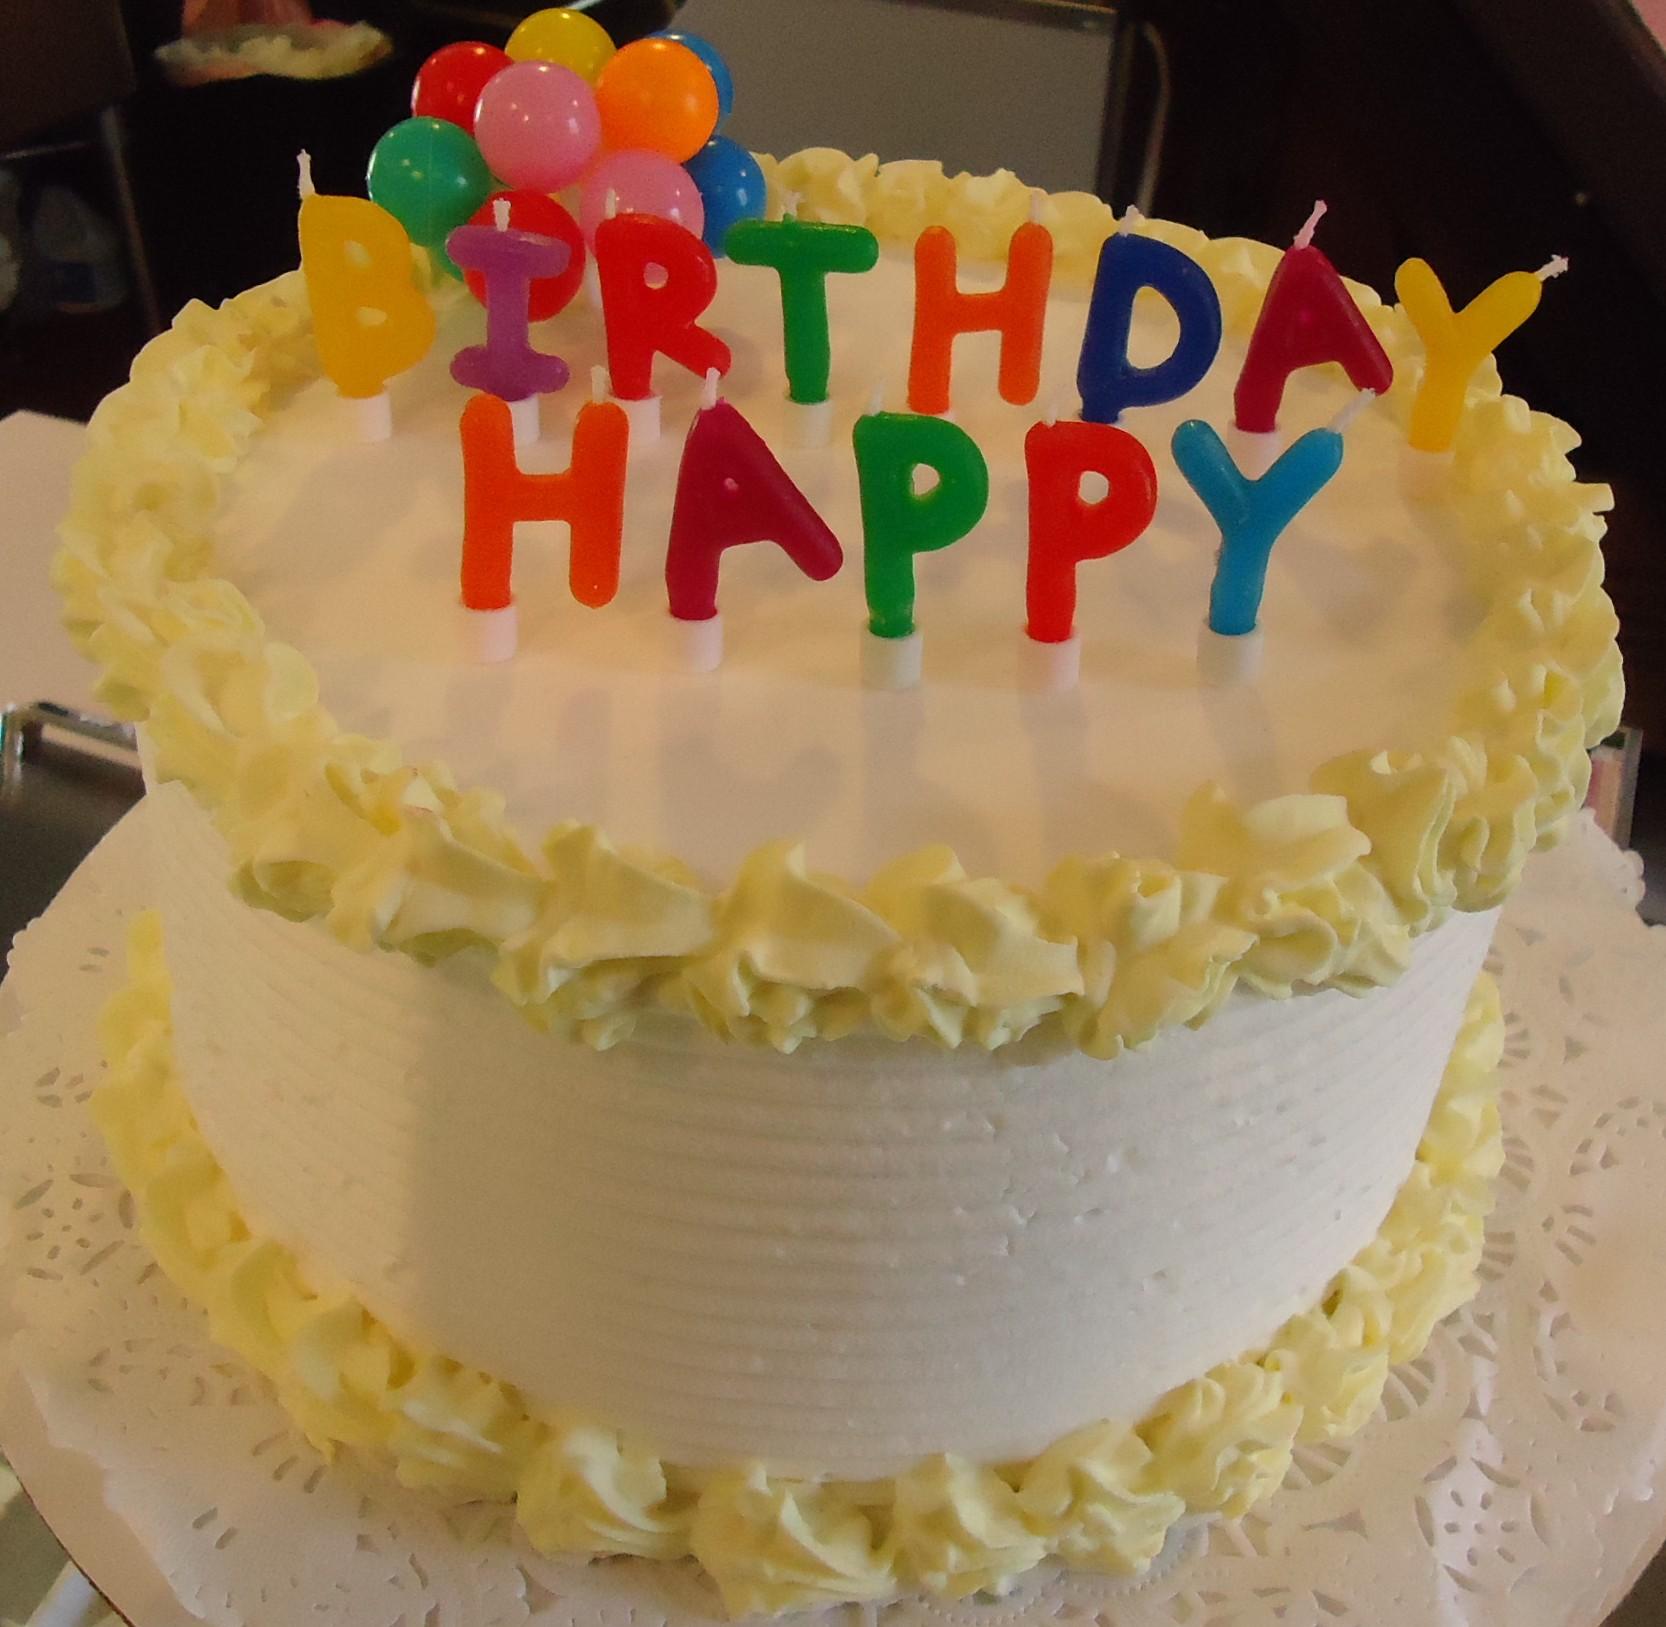 FileBirthday Cake In Ice Cream Shop In Basking Ridge New JerseyJPG